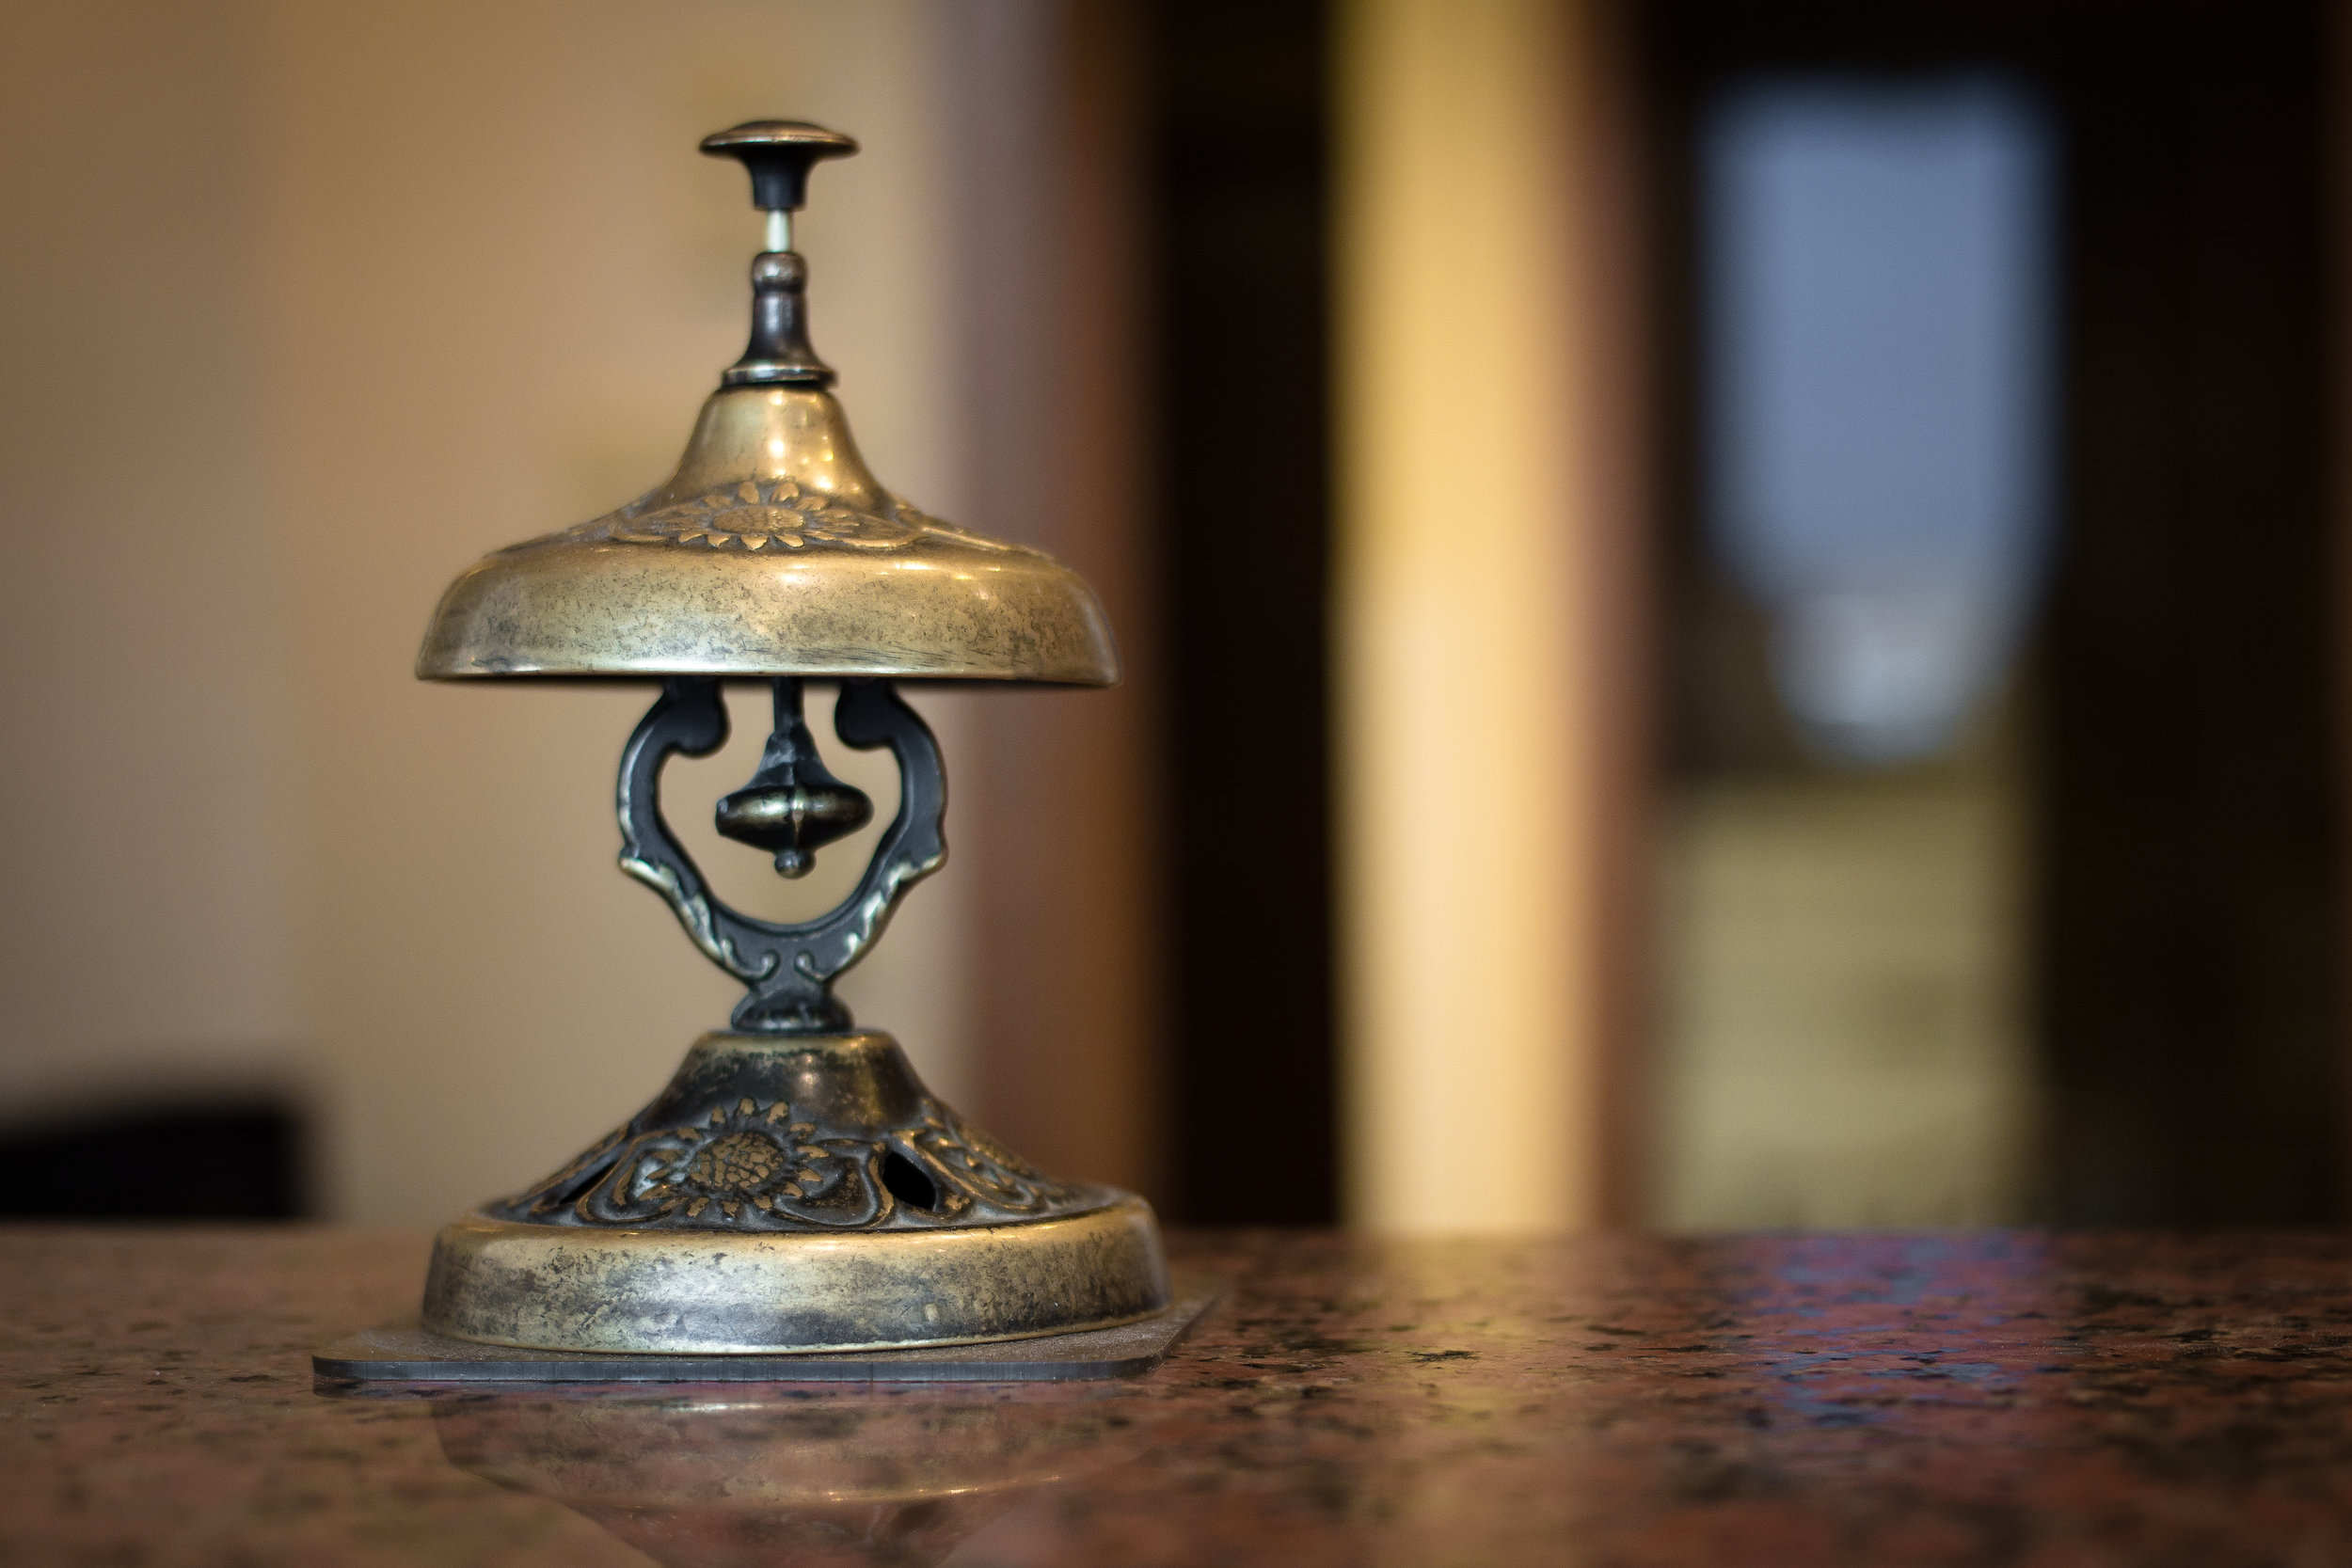 Hotel - Bell.JPG